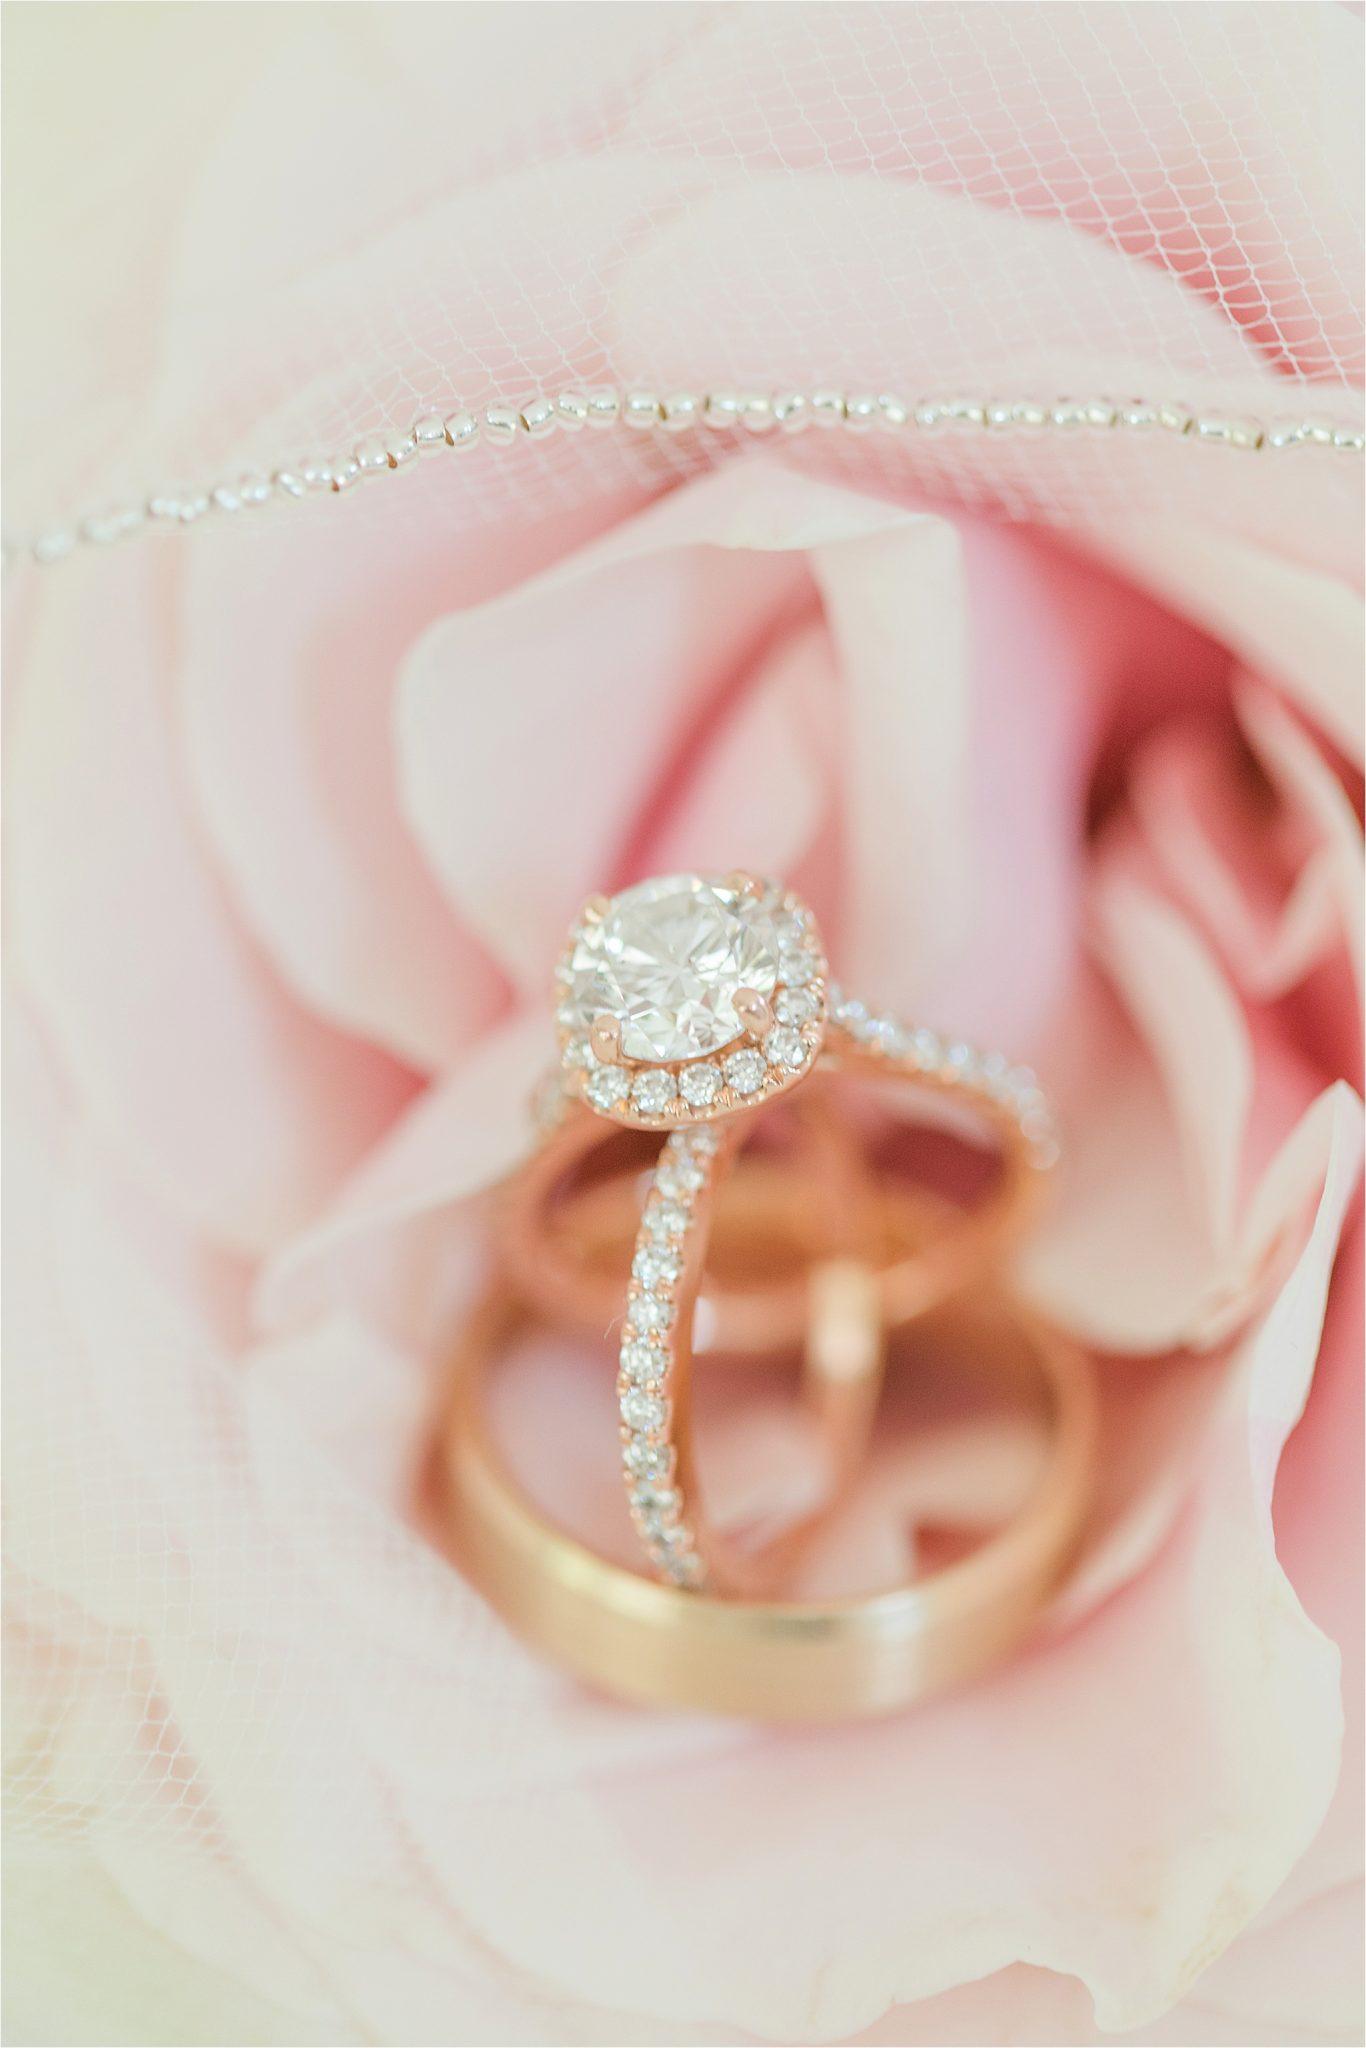 Sonnet House, Birmingham Alabama Wedding Photographer, Wedding ring, wedding jewelry